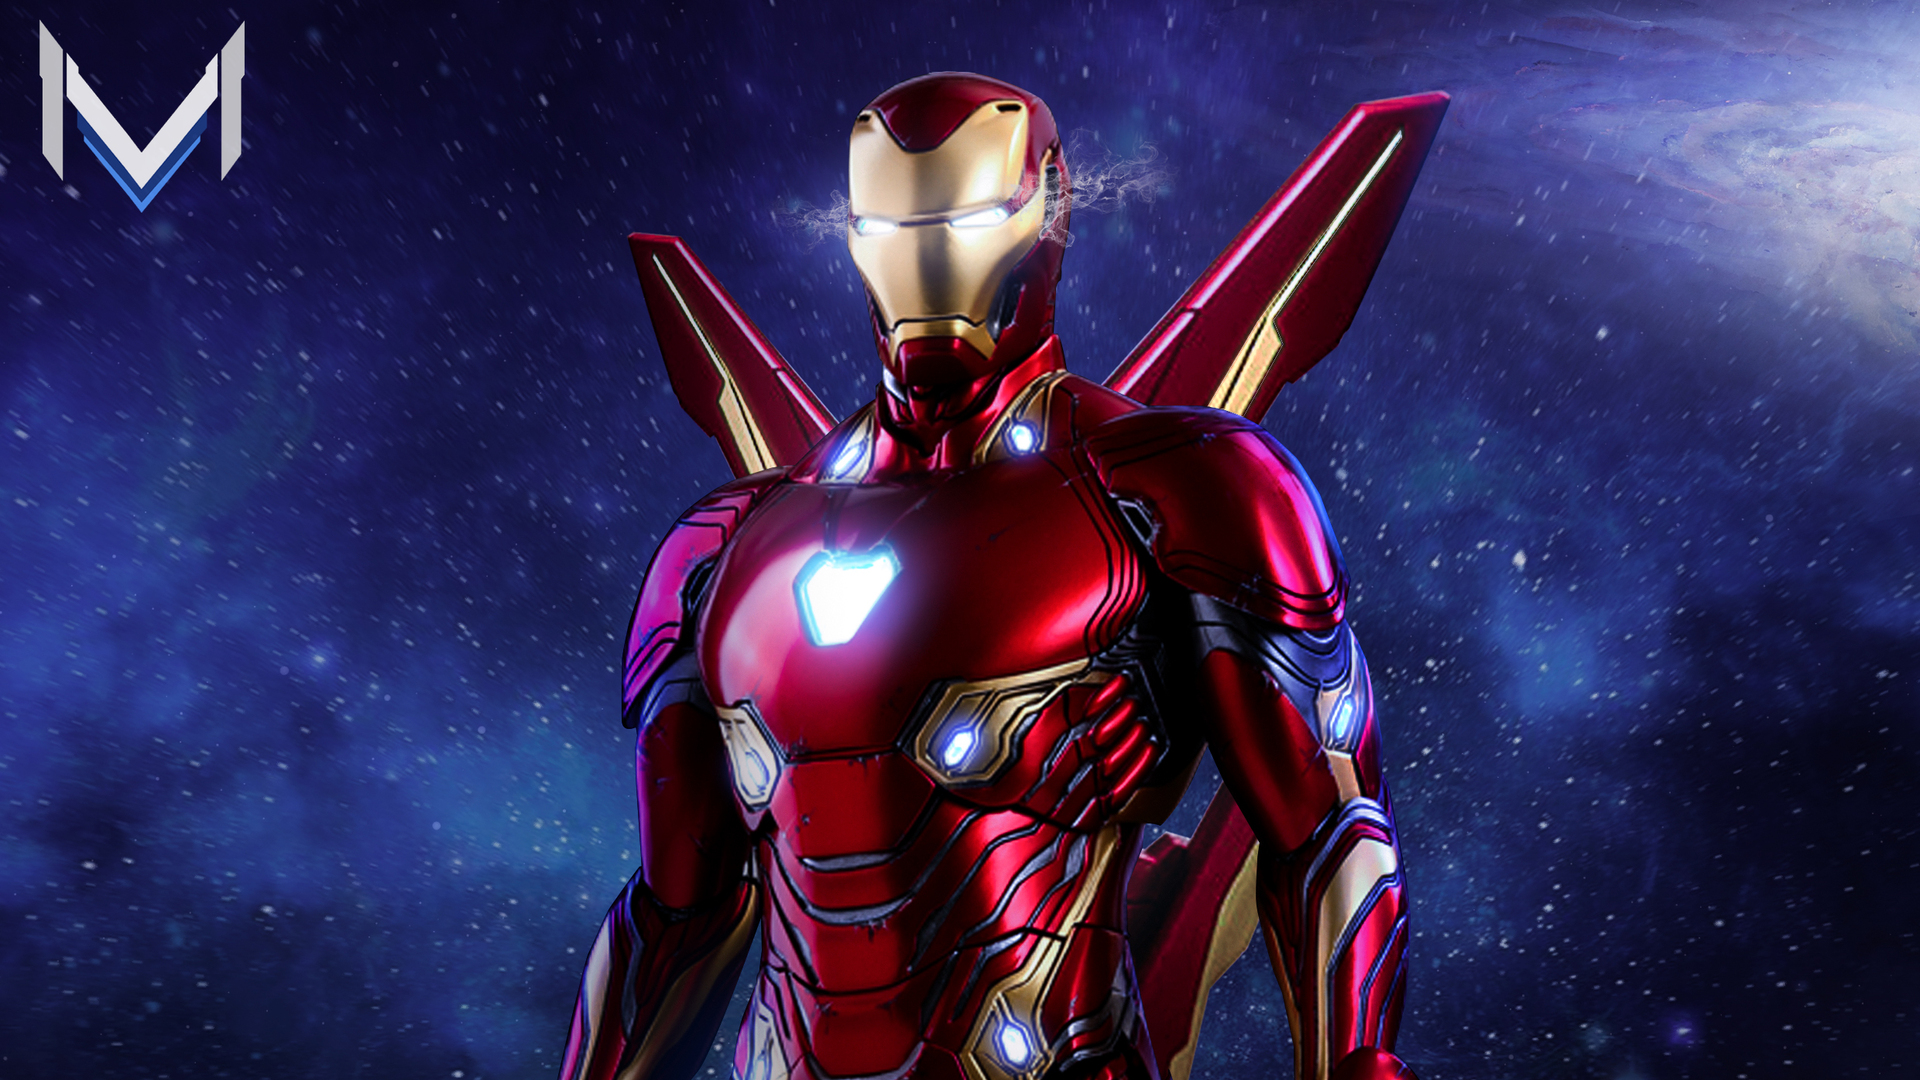 1920x1080 iron man avengers infinity war suit artwork laptop full hd